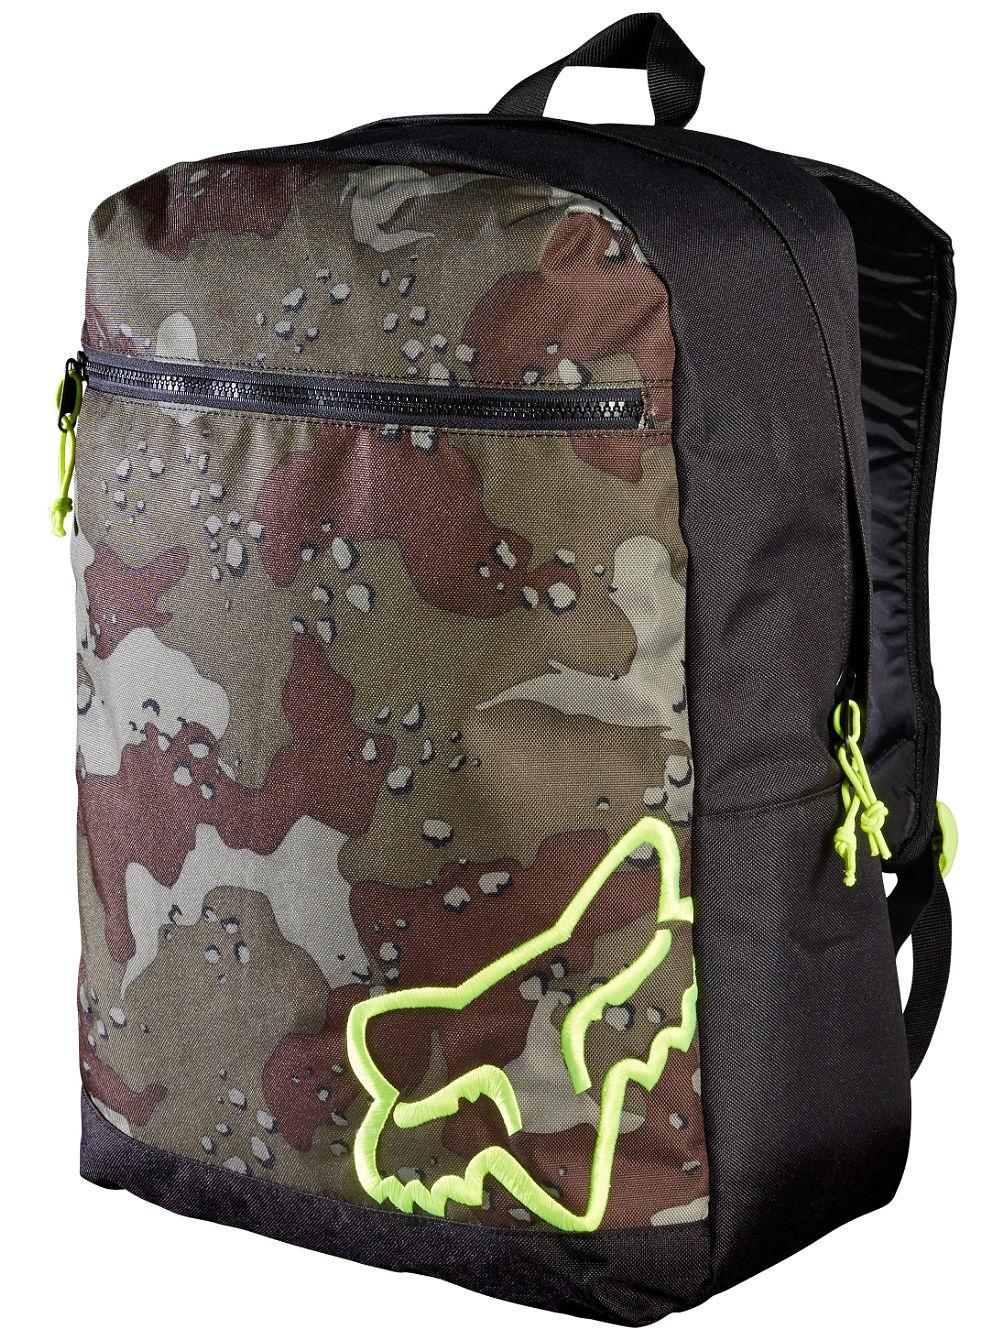 conner-hazzard-backpack